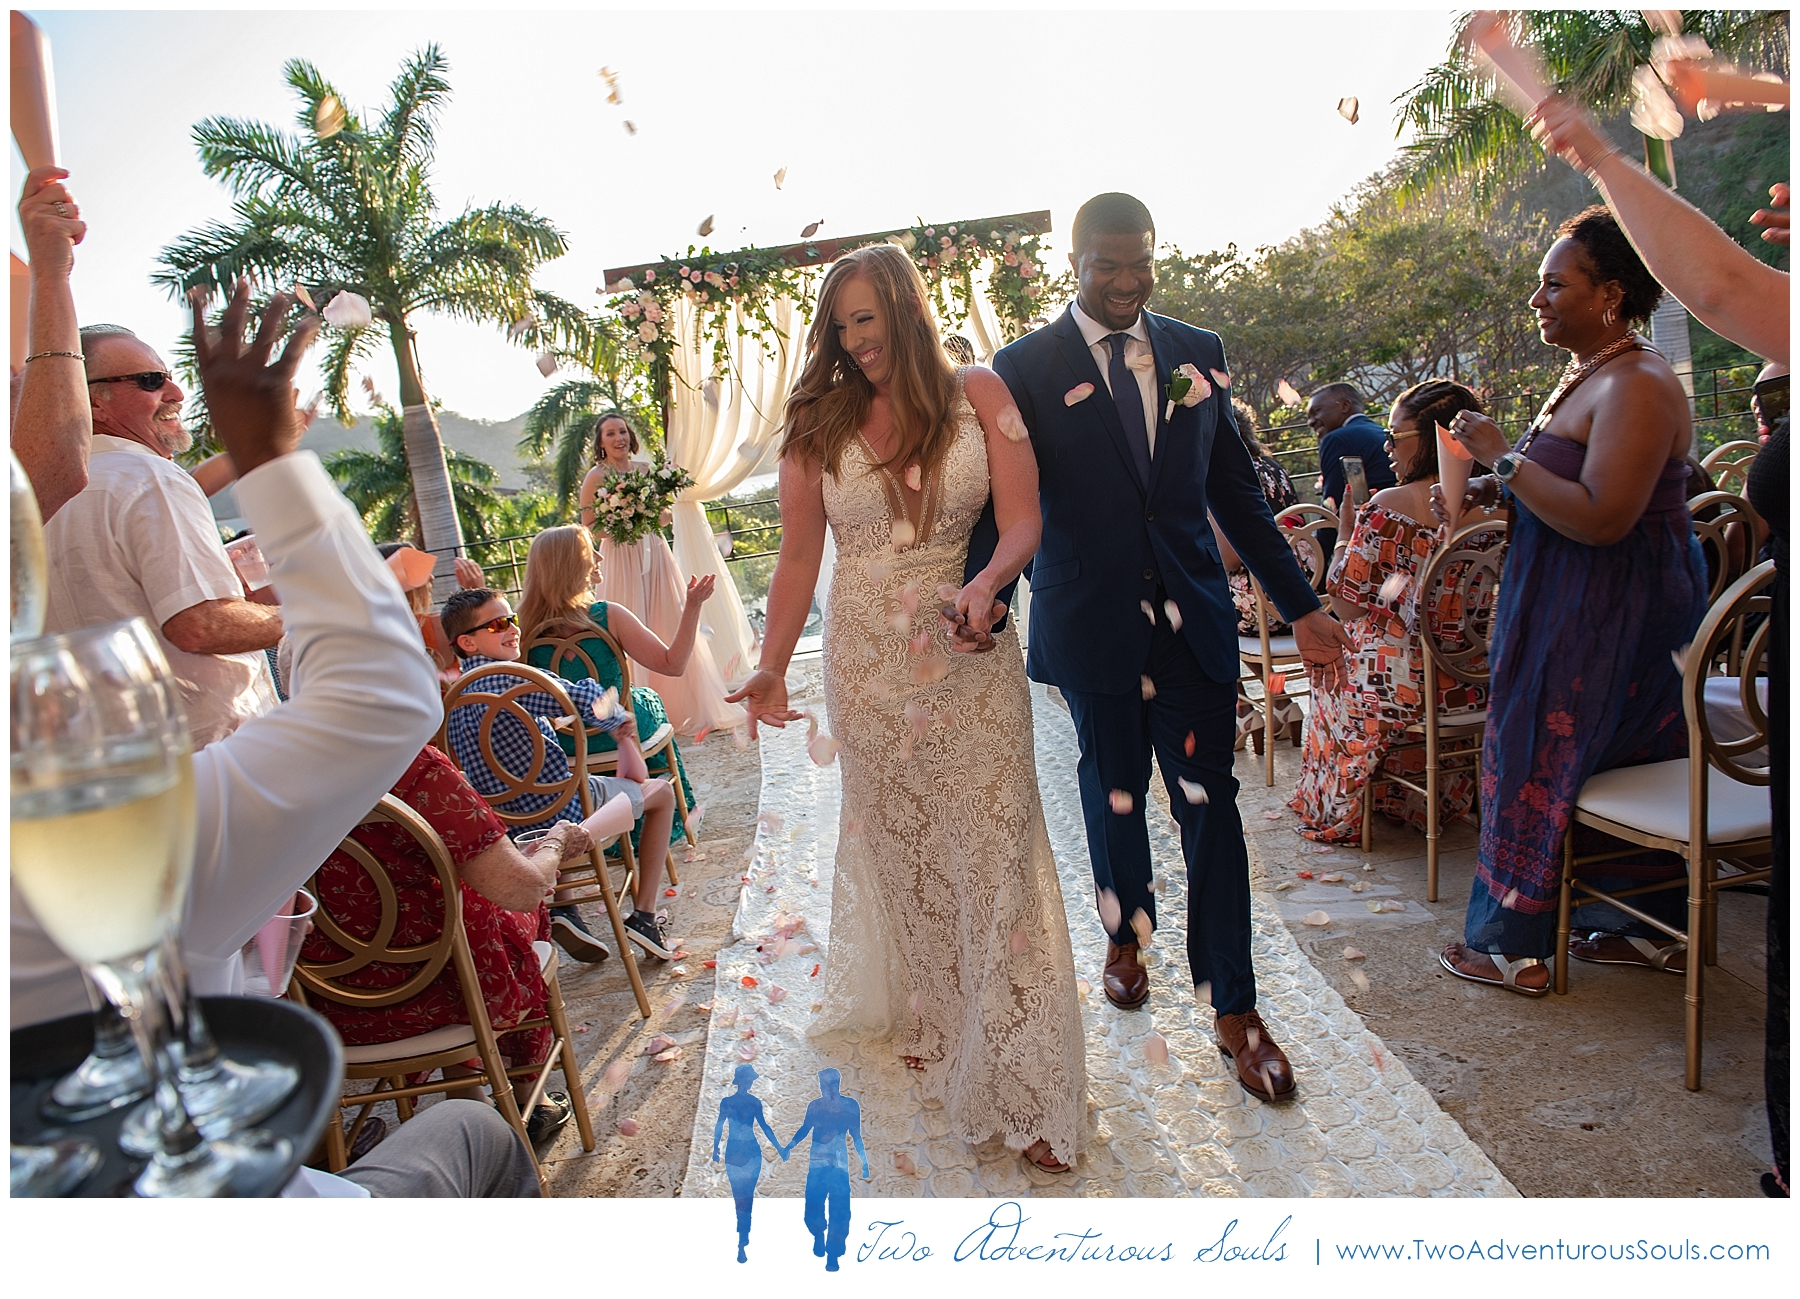 Costa Rica Wedding Photographers, Dreams las Mareas Wedding, Destination Wedding Photographers, Two Adventurous Souls - 022219_0027.jpg